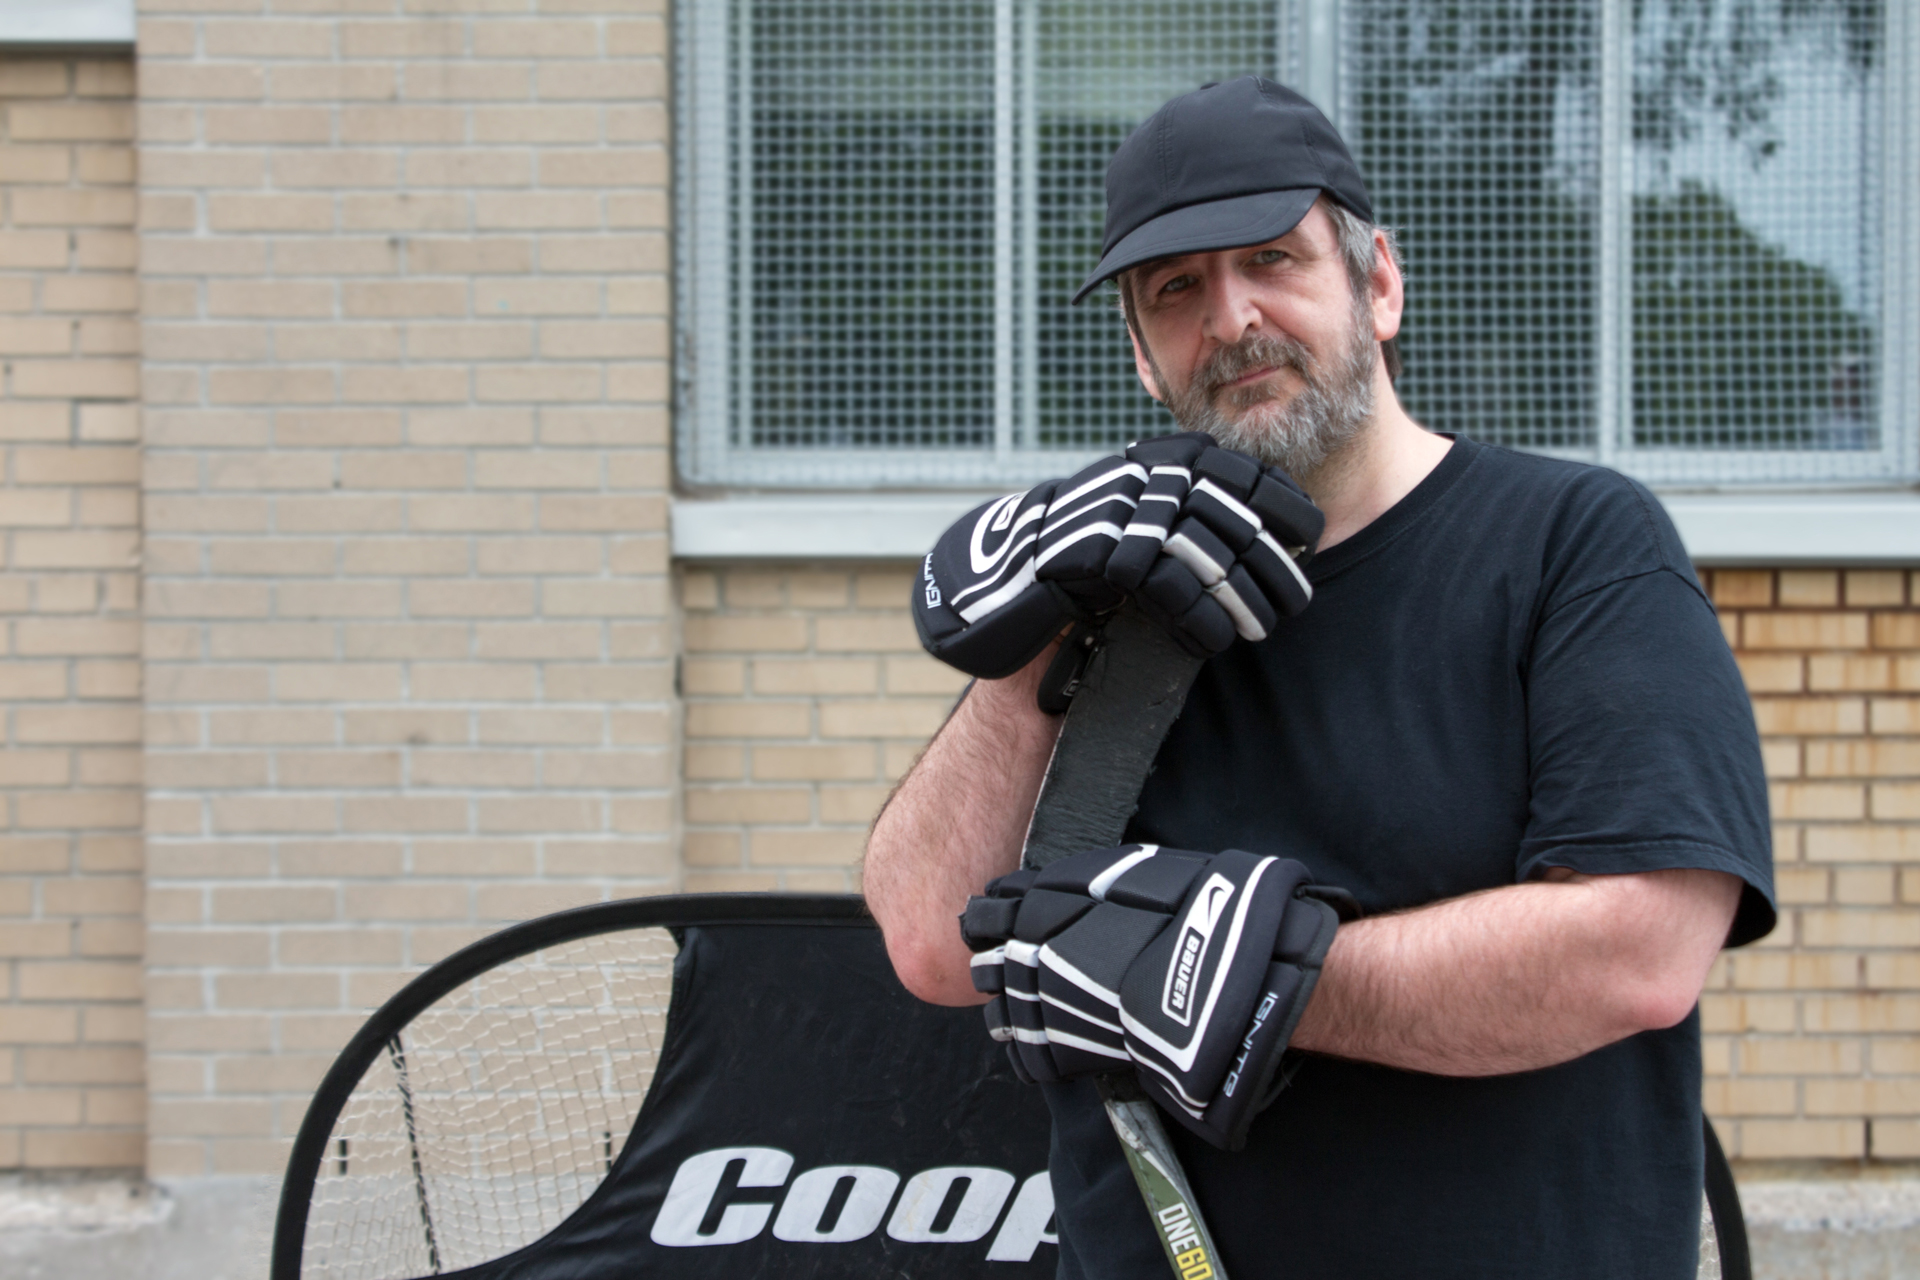 Tayaout-Nicolas local hockey star!